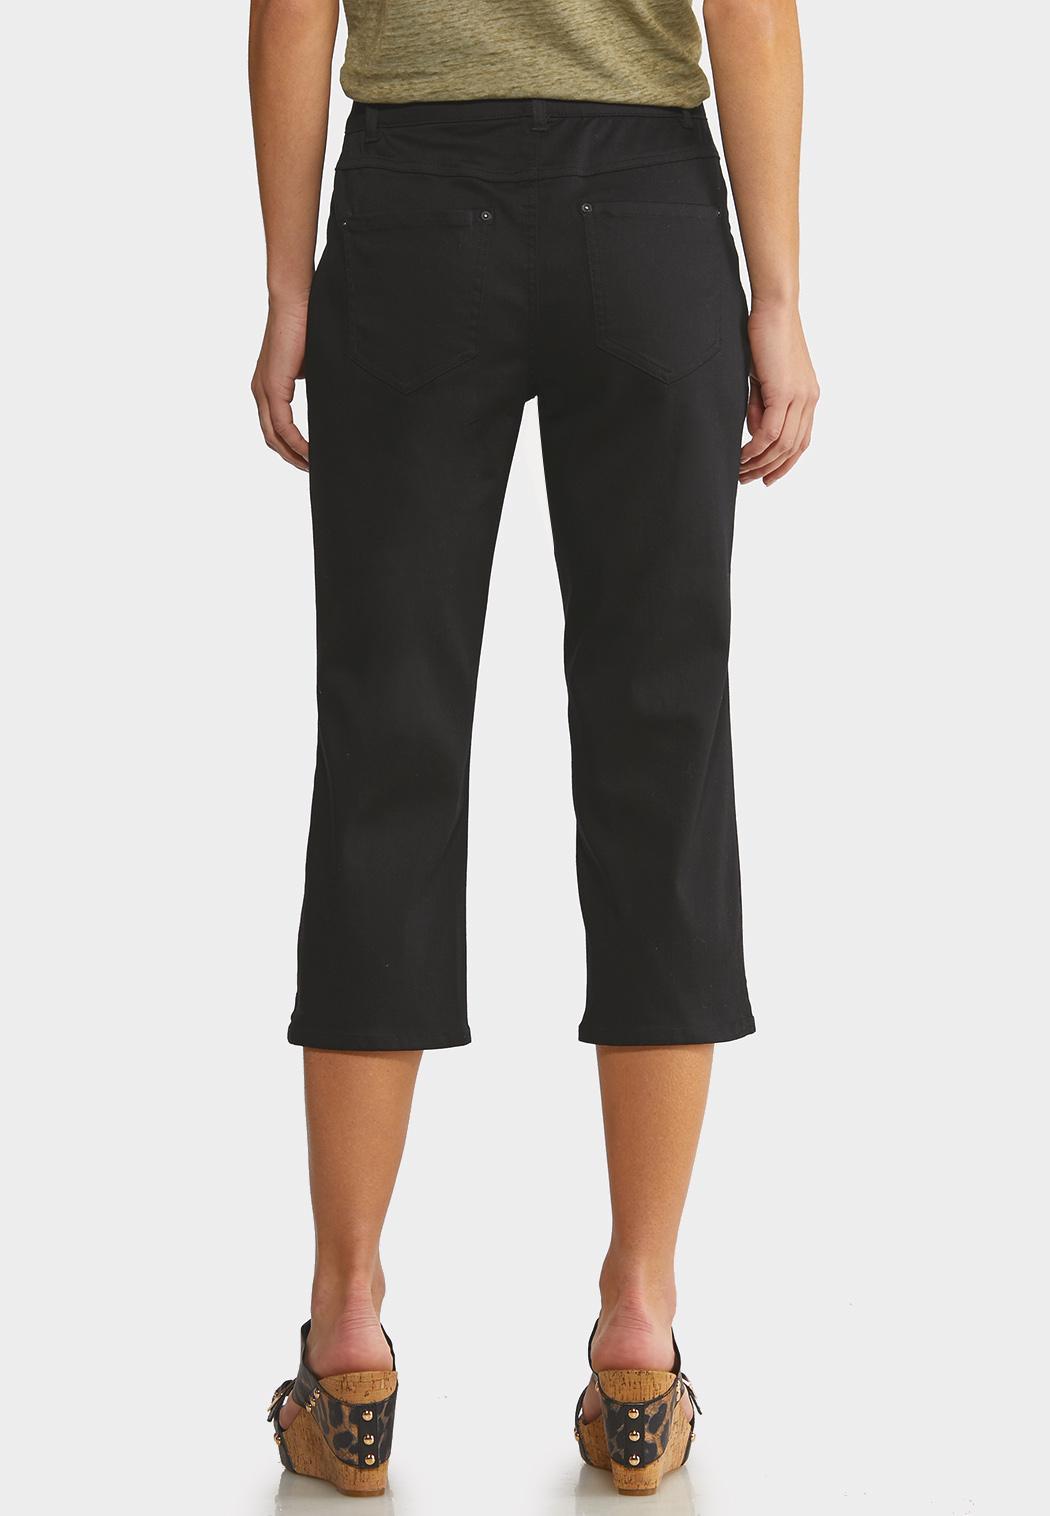 Cropped Black Jeans (Item #44152683)